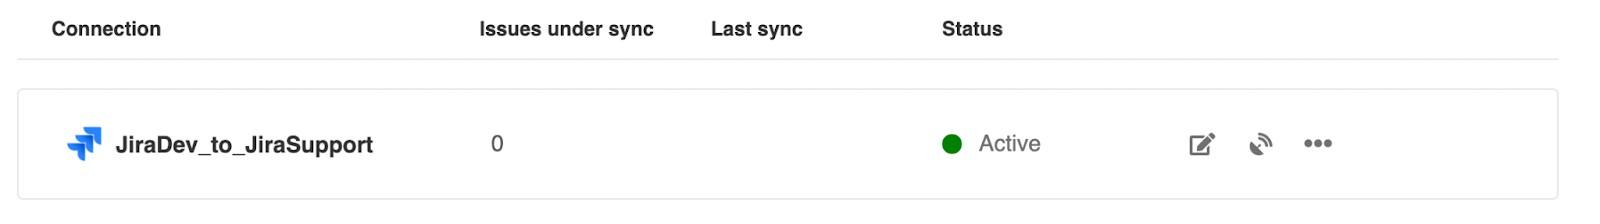 jira cloud to server sync